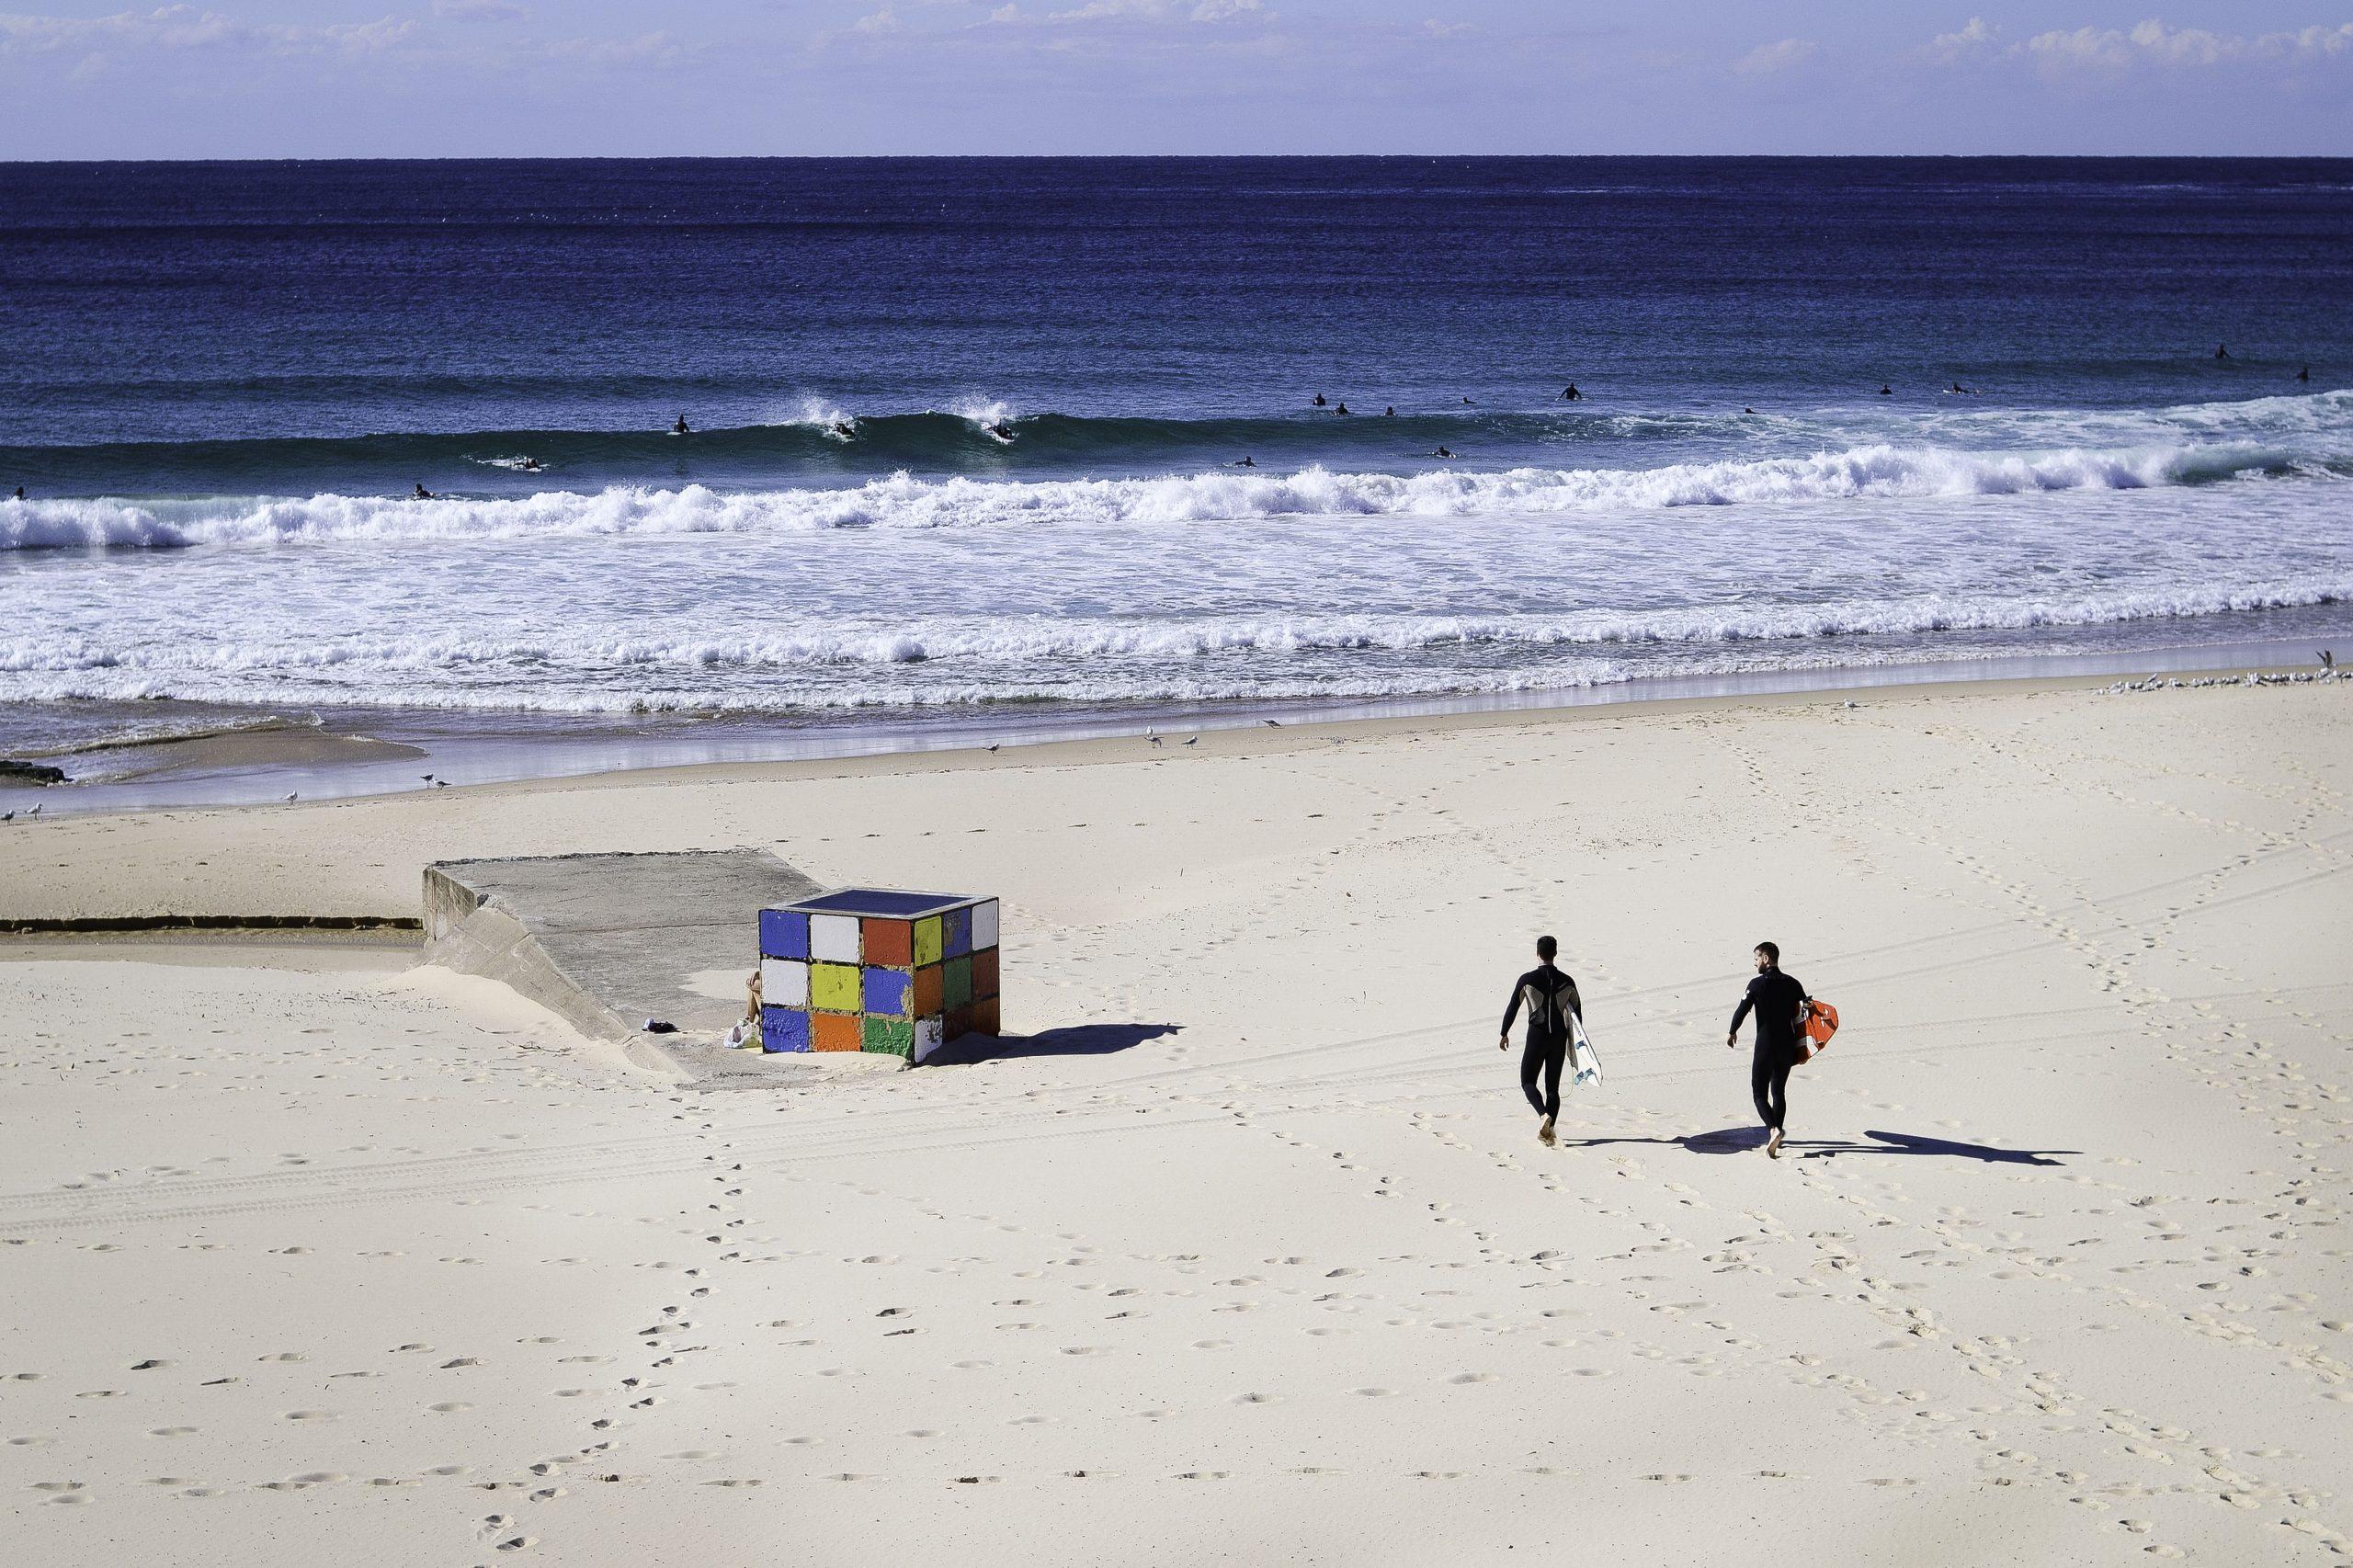 surfers walking to the ocean